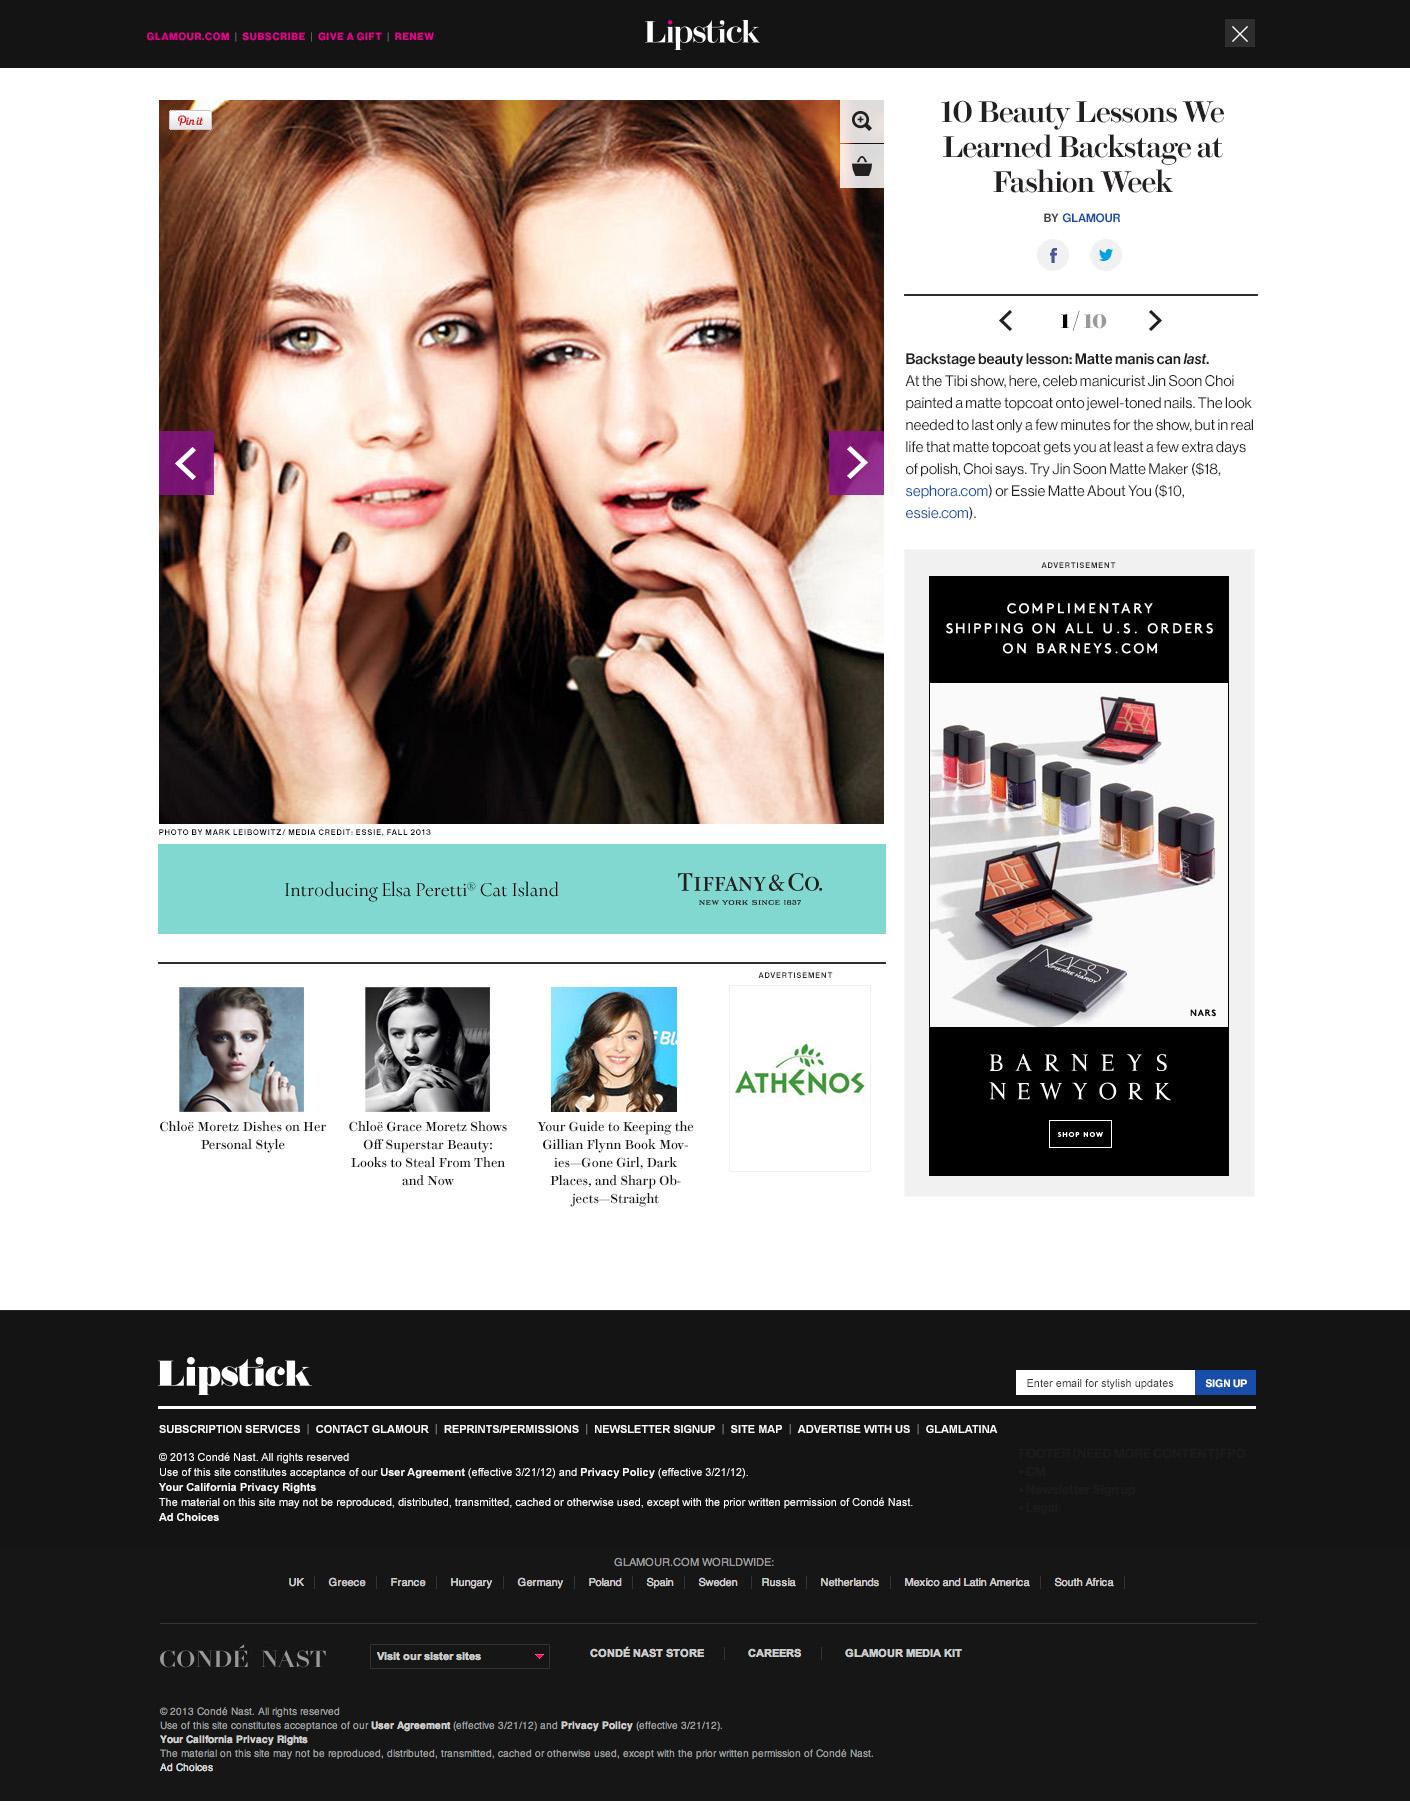 Lipstick_Slideshowf_1_1.jpg